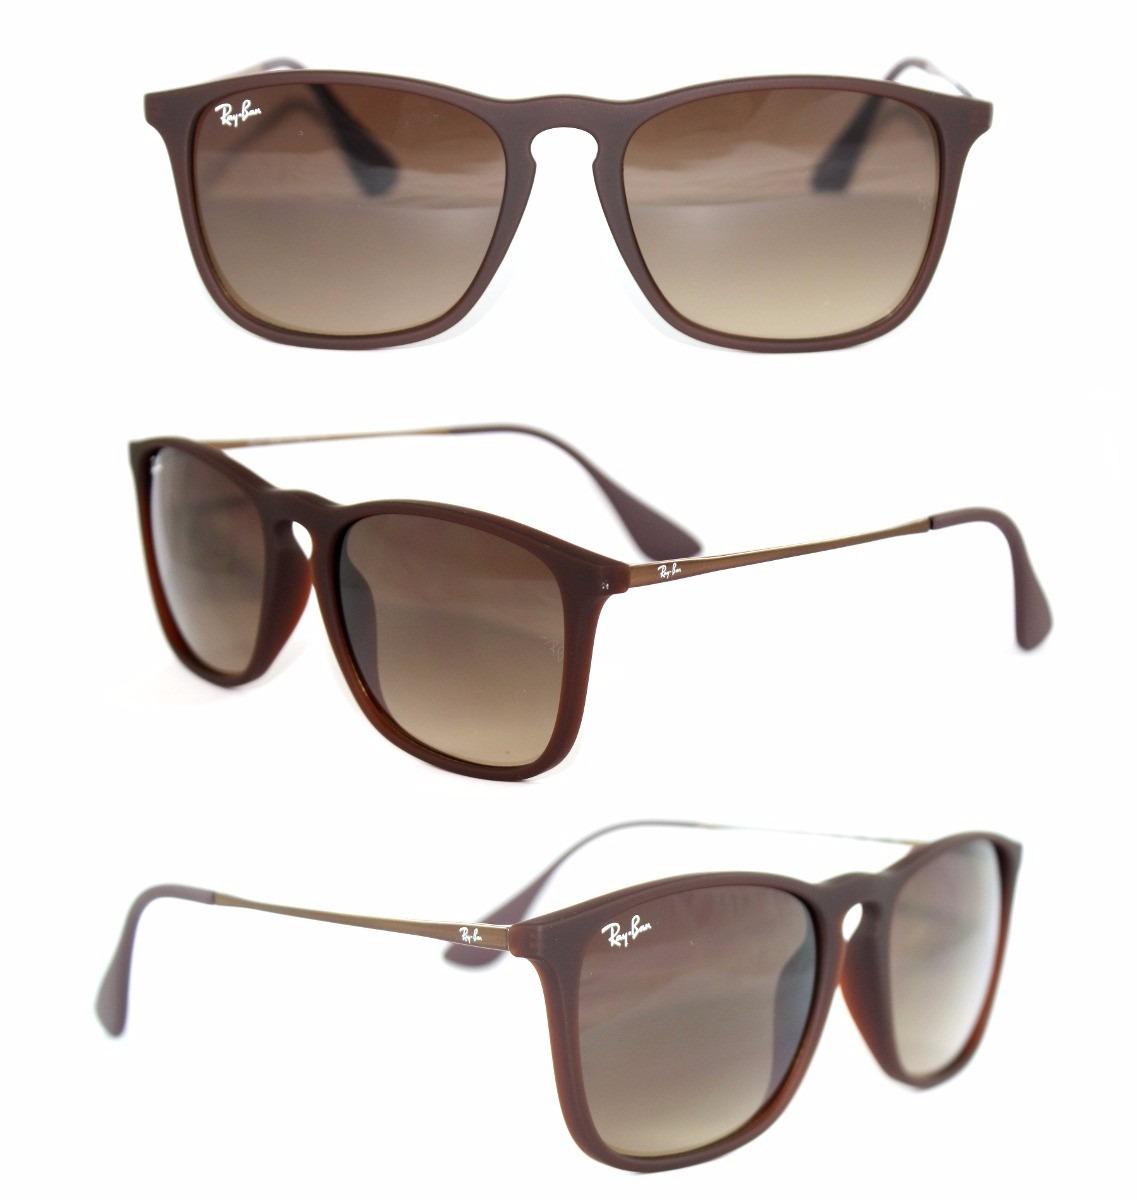 3f7311668 Óculos De Sol Feminino Ray-ban Modelo Erika Rb4171 - R$ 159,00 em ...